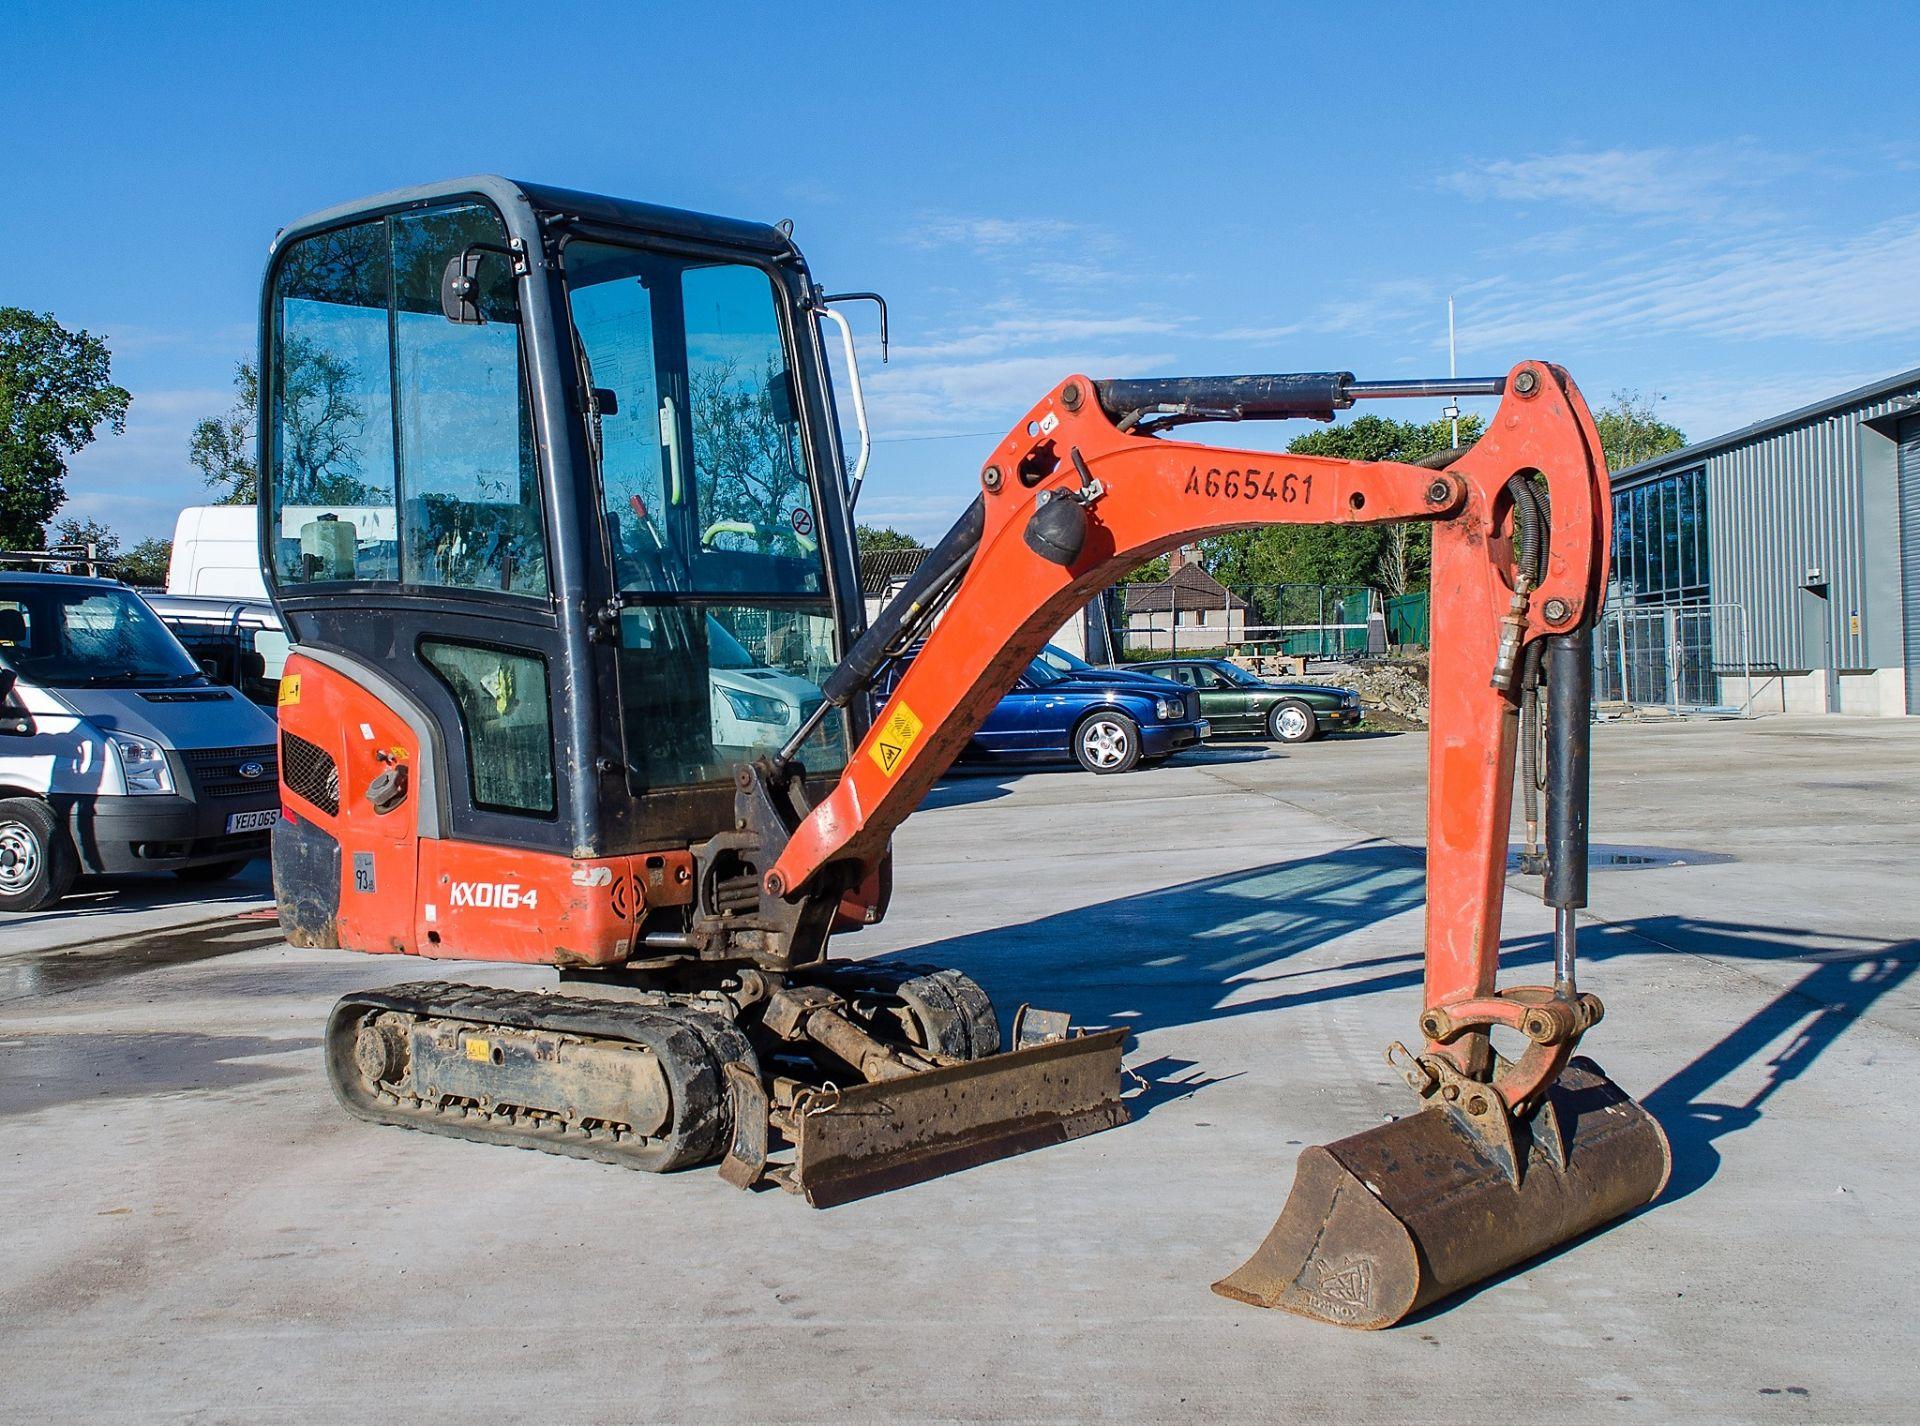 Kubota KX016-4 1.5 tonne rubber tracked mini excavator Year: 2015 S/N: 58688 Recorded Hours: 1736 - Image 2 of 19